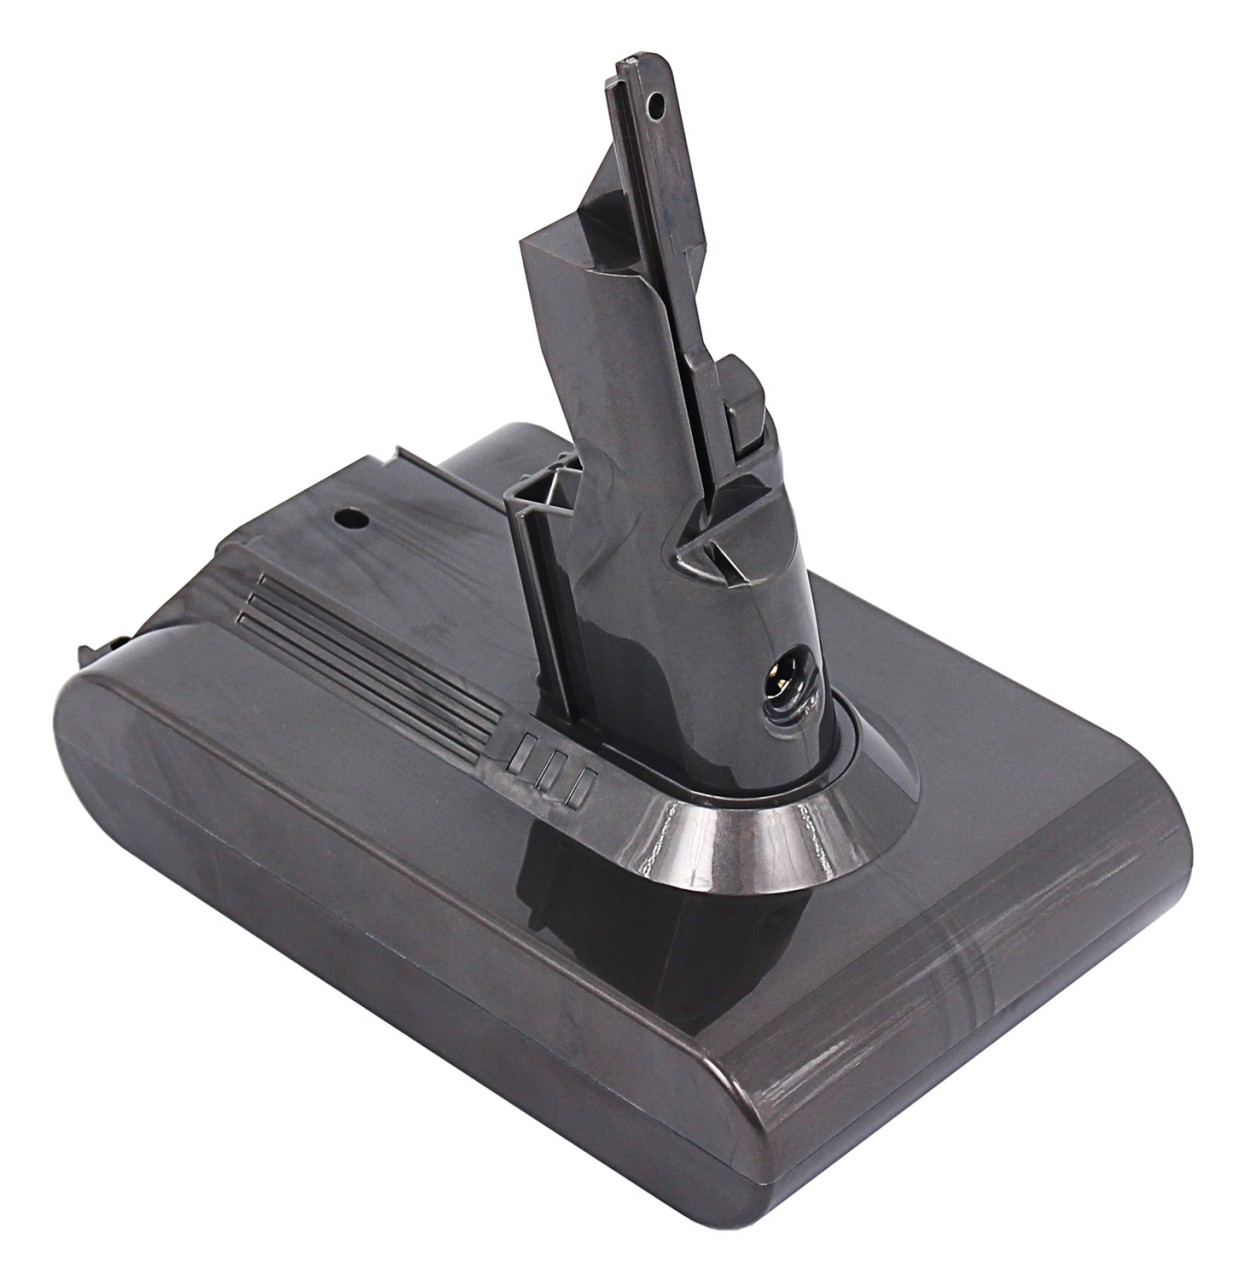 PATONA Premium Battery for Dyson V7 Motorkopf Trigger Tier A